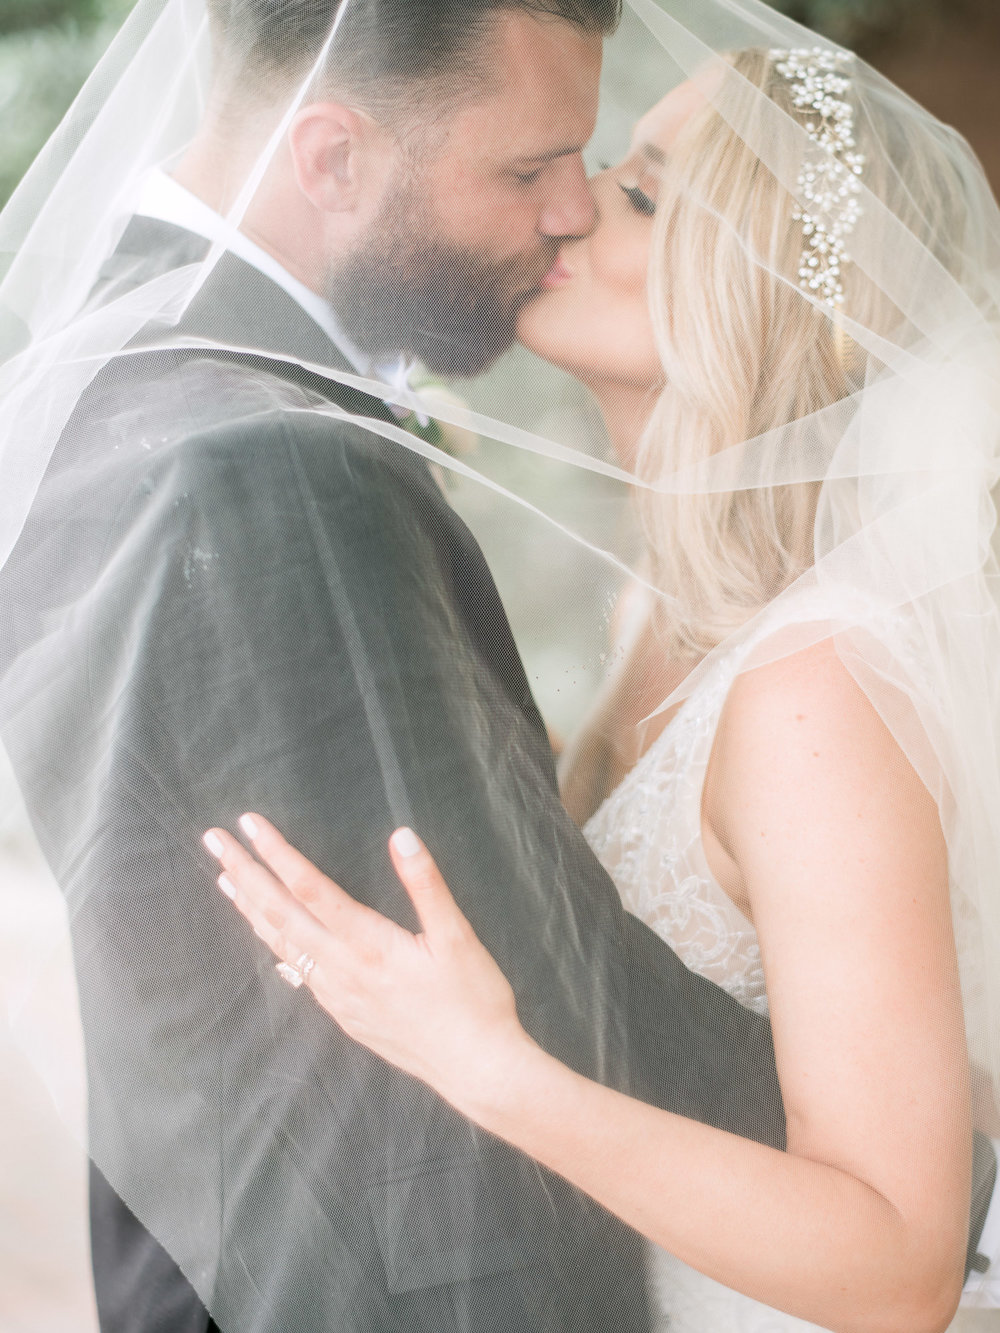 raleigh-miami-beach-destination-film-wedding-1200.jpg